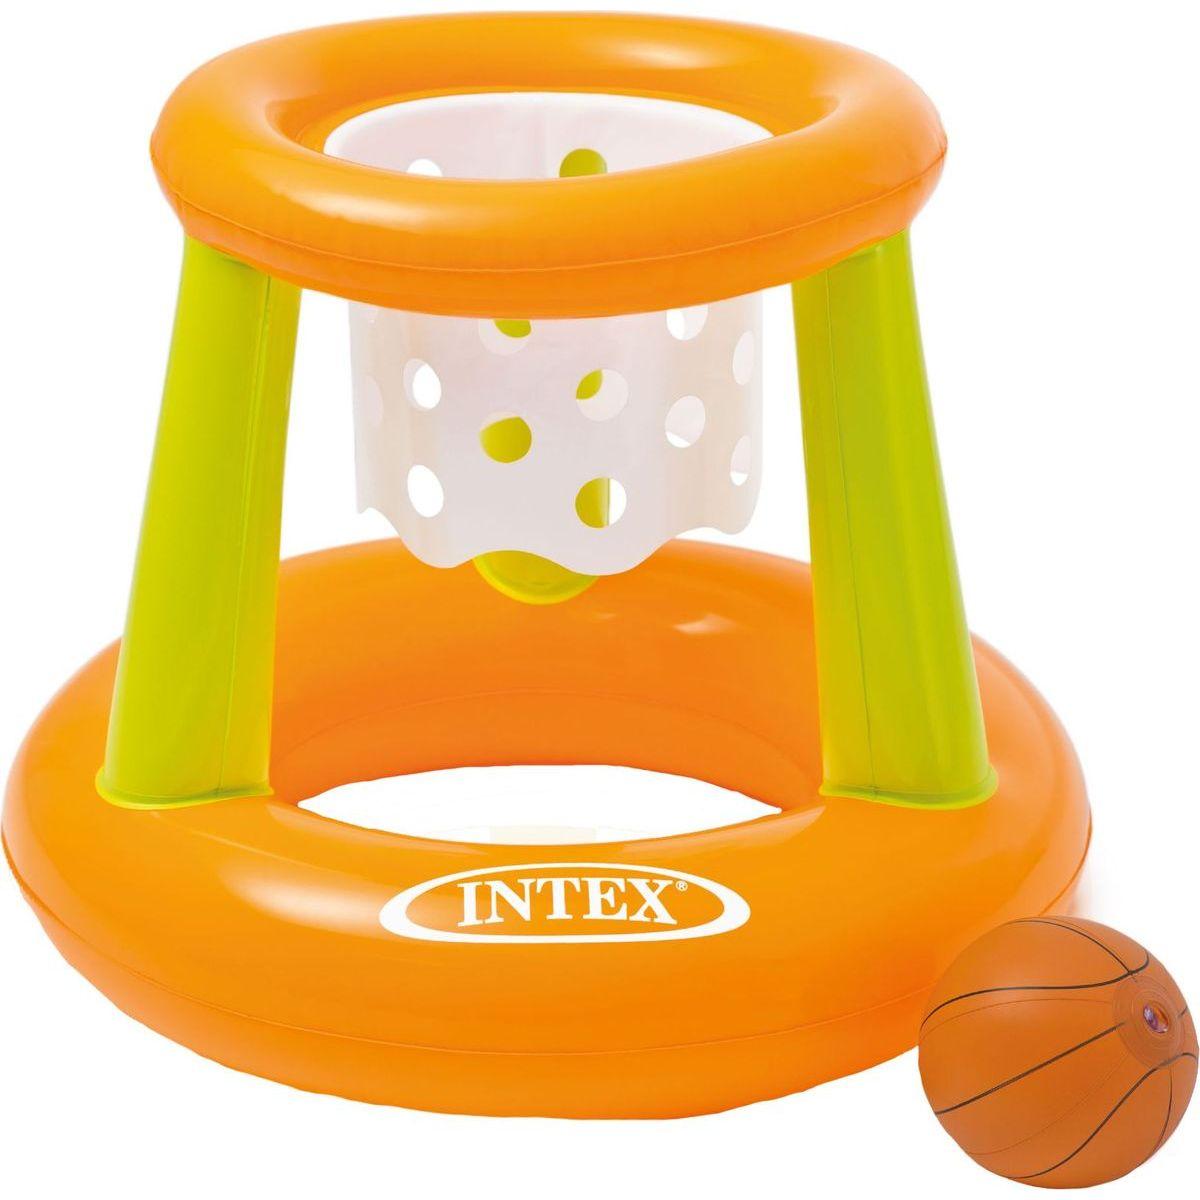 Plovací koš Intex 58504